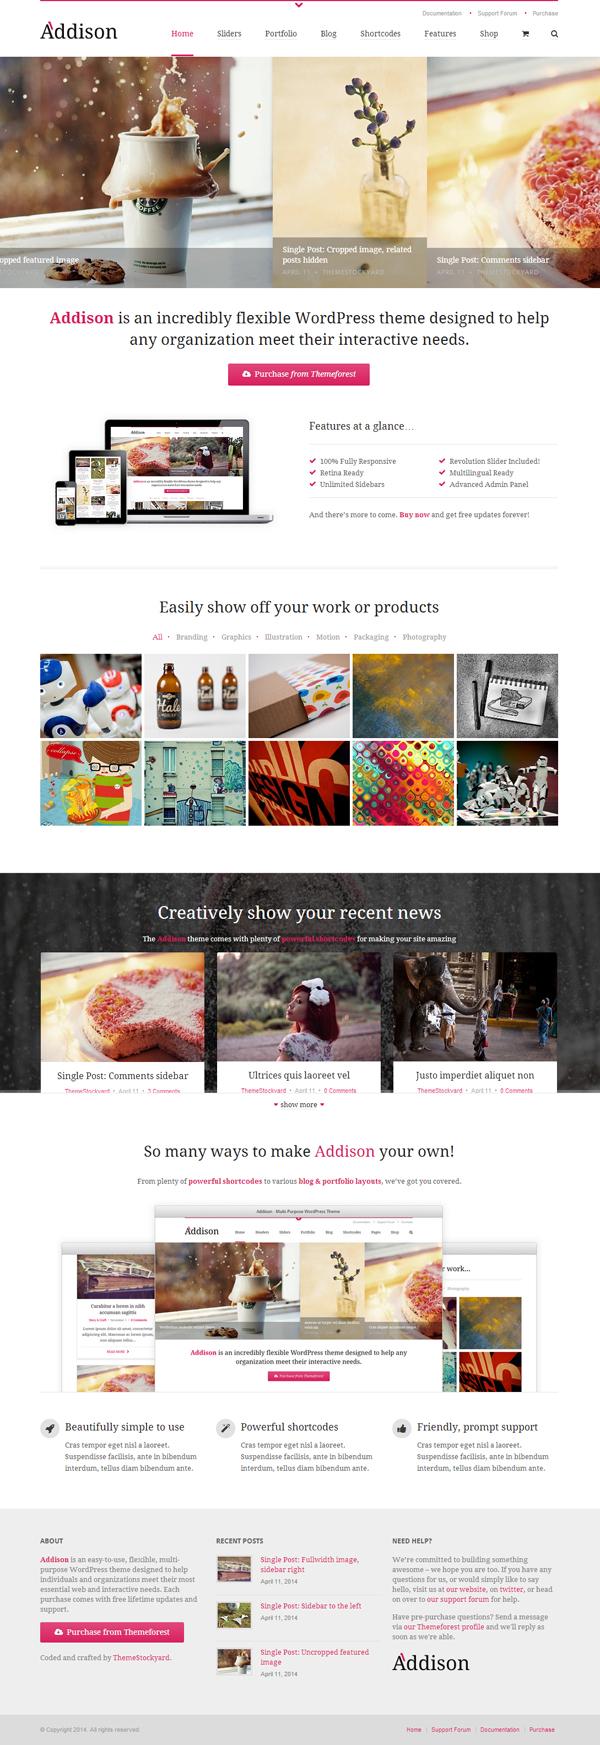 Addison - Premium Multi-Purpose WordPress Theme